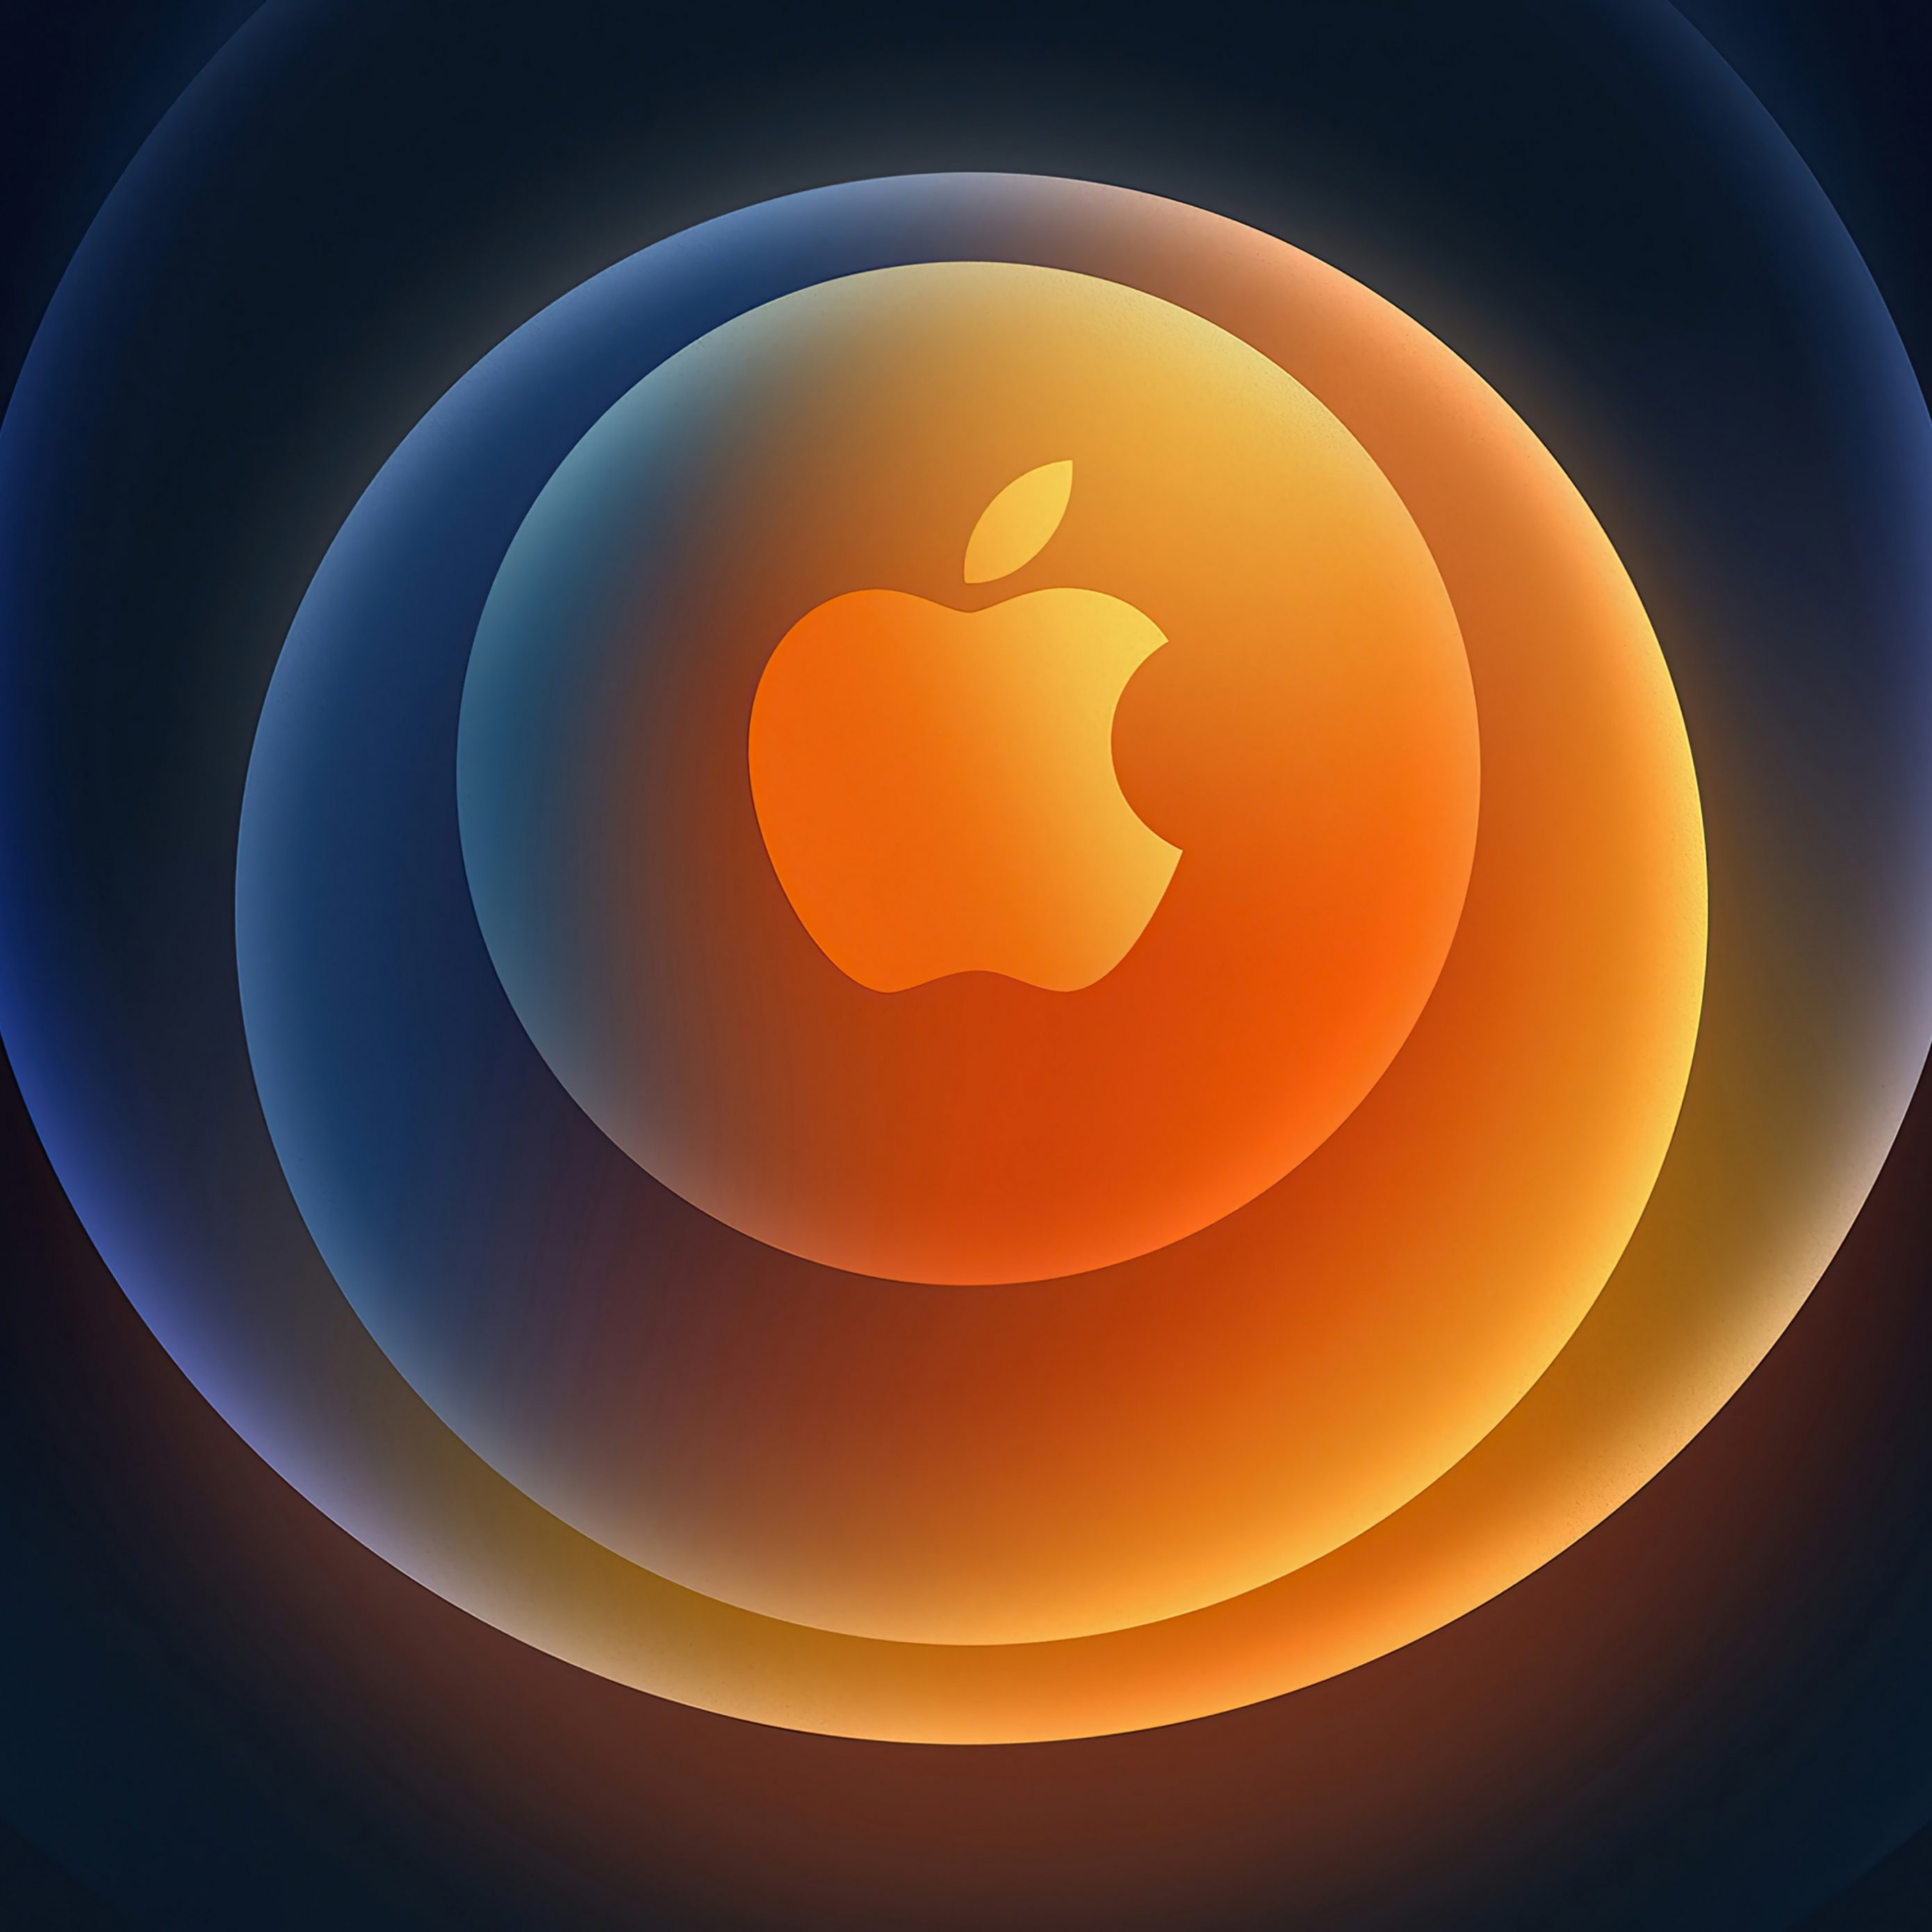 2780x2780 Parallax wallpaper 4k iPhone 12 Apple Logo Circles iPad Wallpaper 2780x2780 pixels resolution